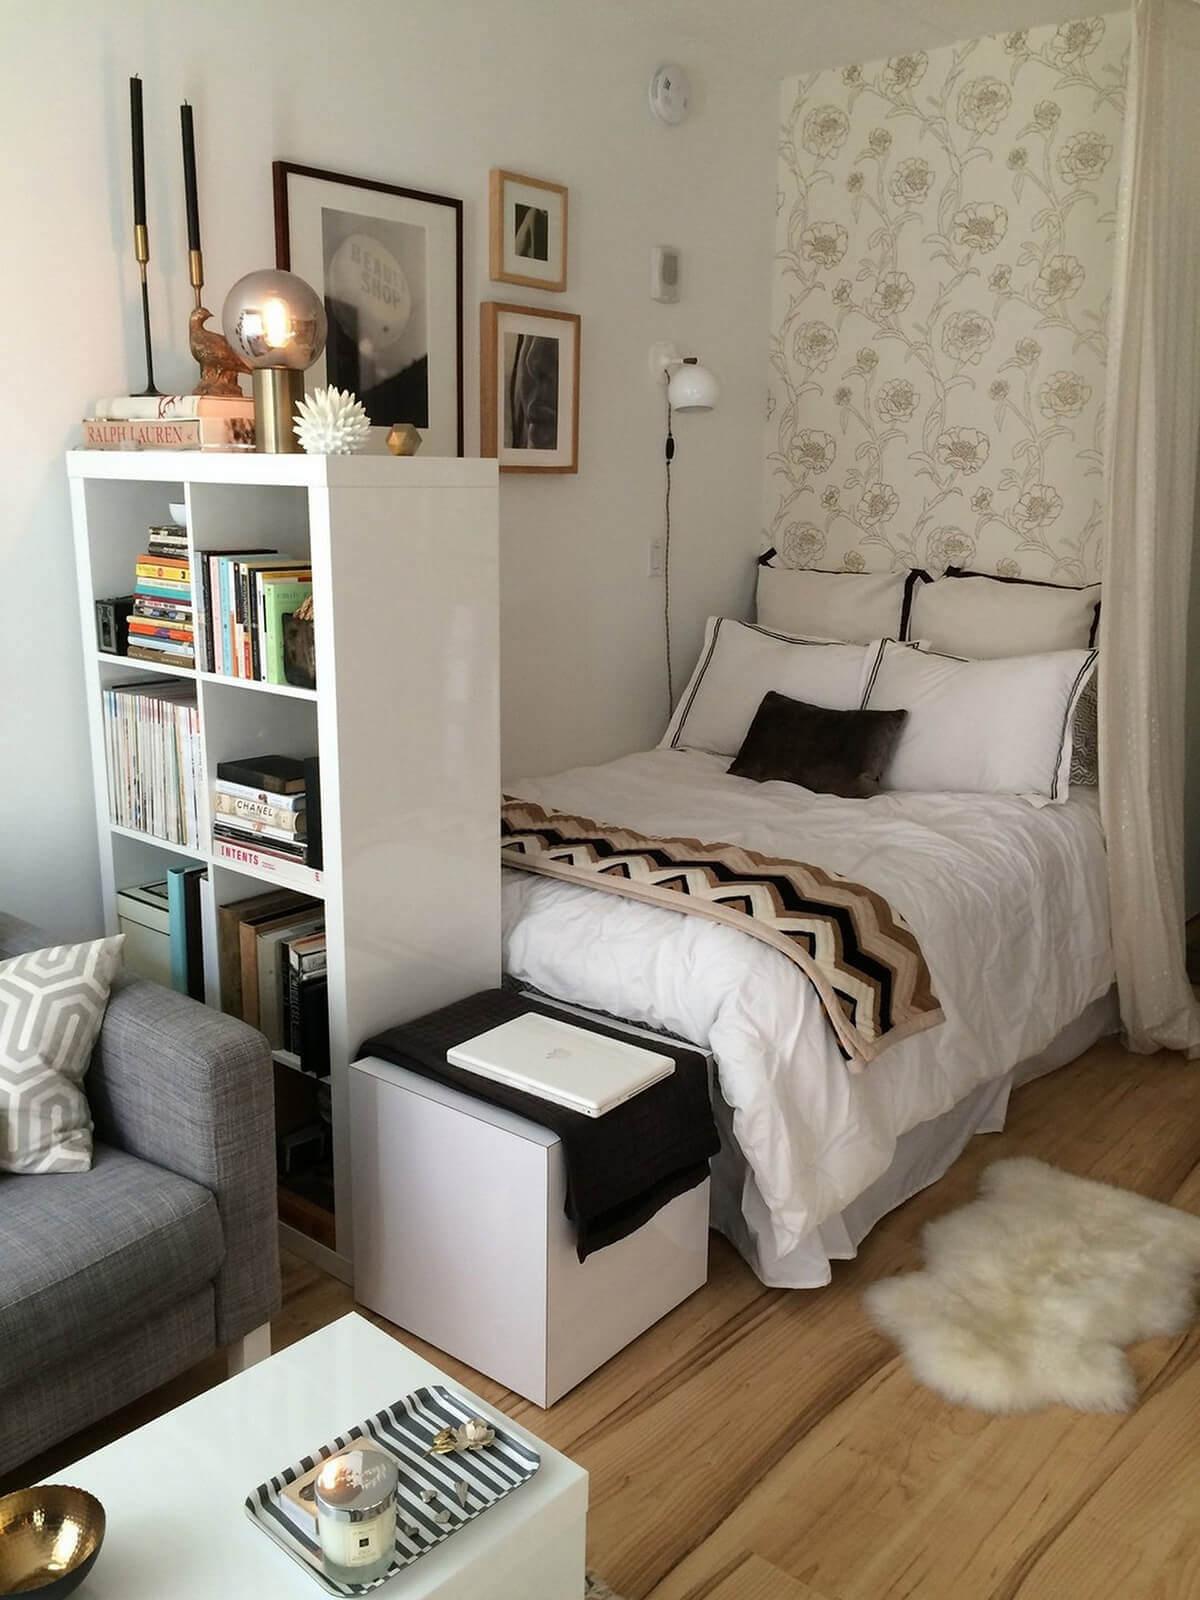 28 Small Bedroom Organization Ideas That Are Smart And Stylish Sharp Aspirant